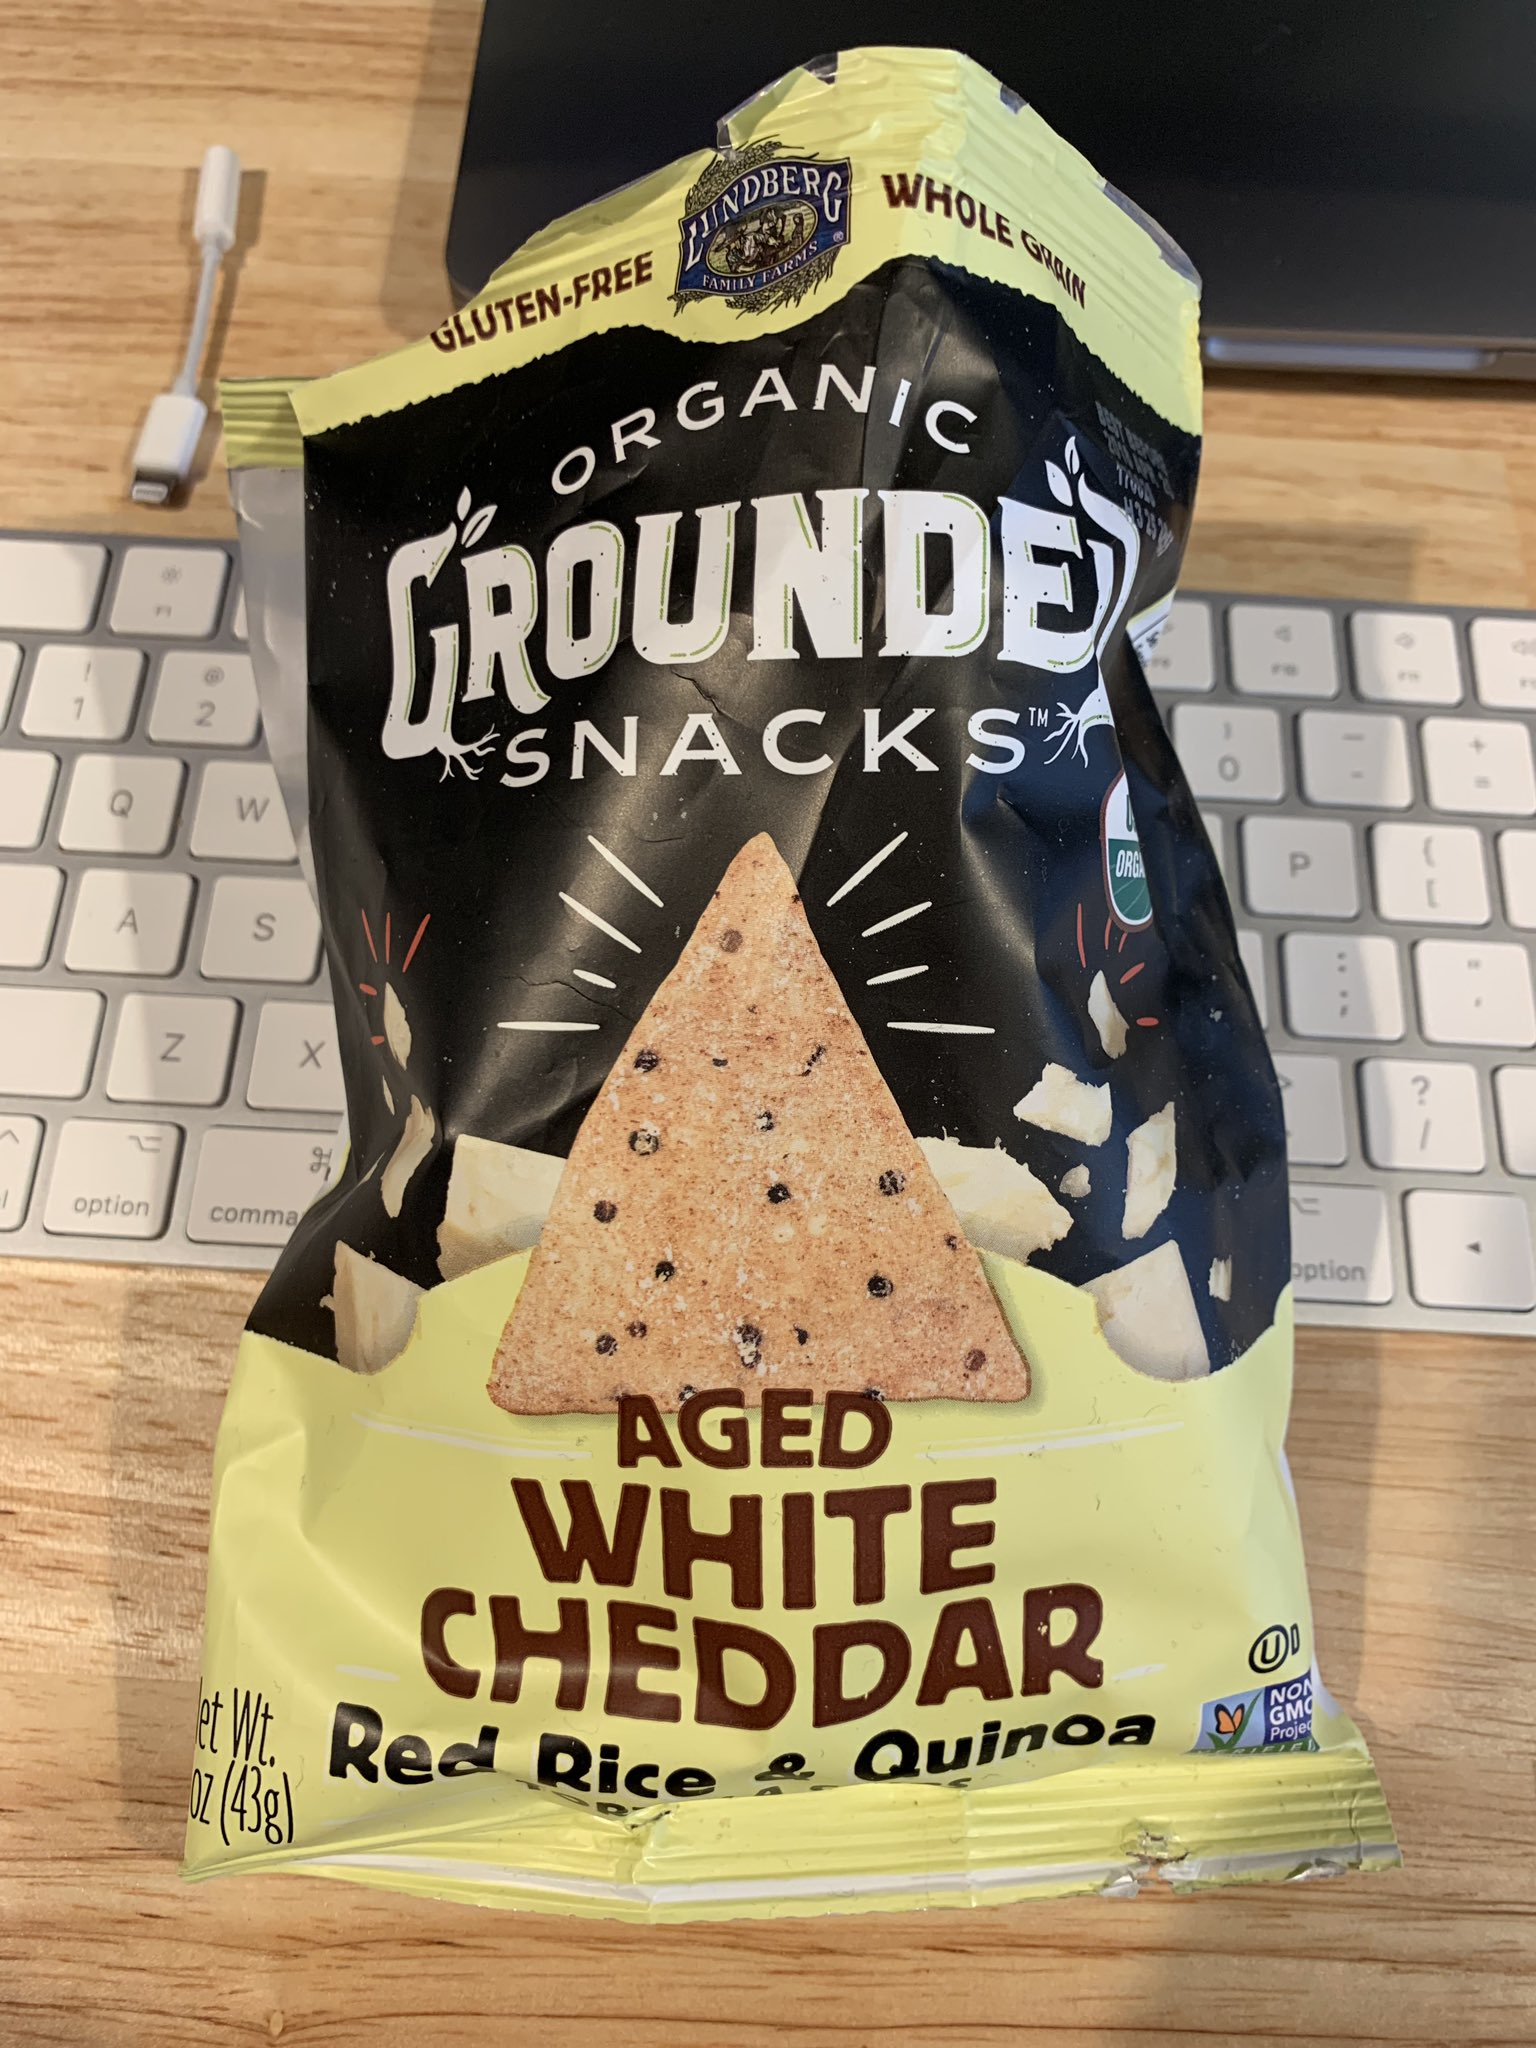 These are terrible. https://t.co/fSwhK7e1bz